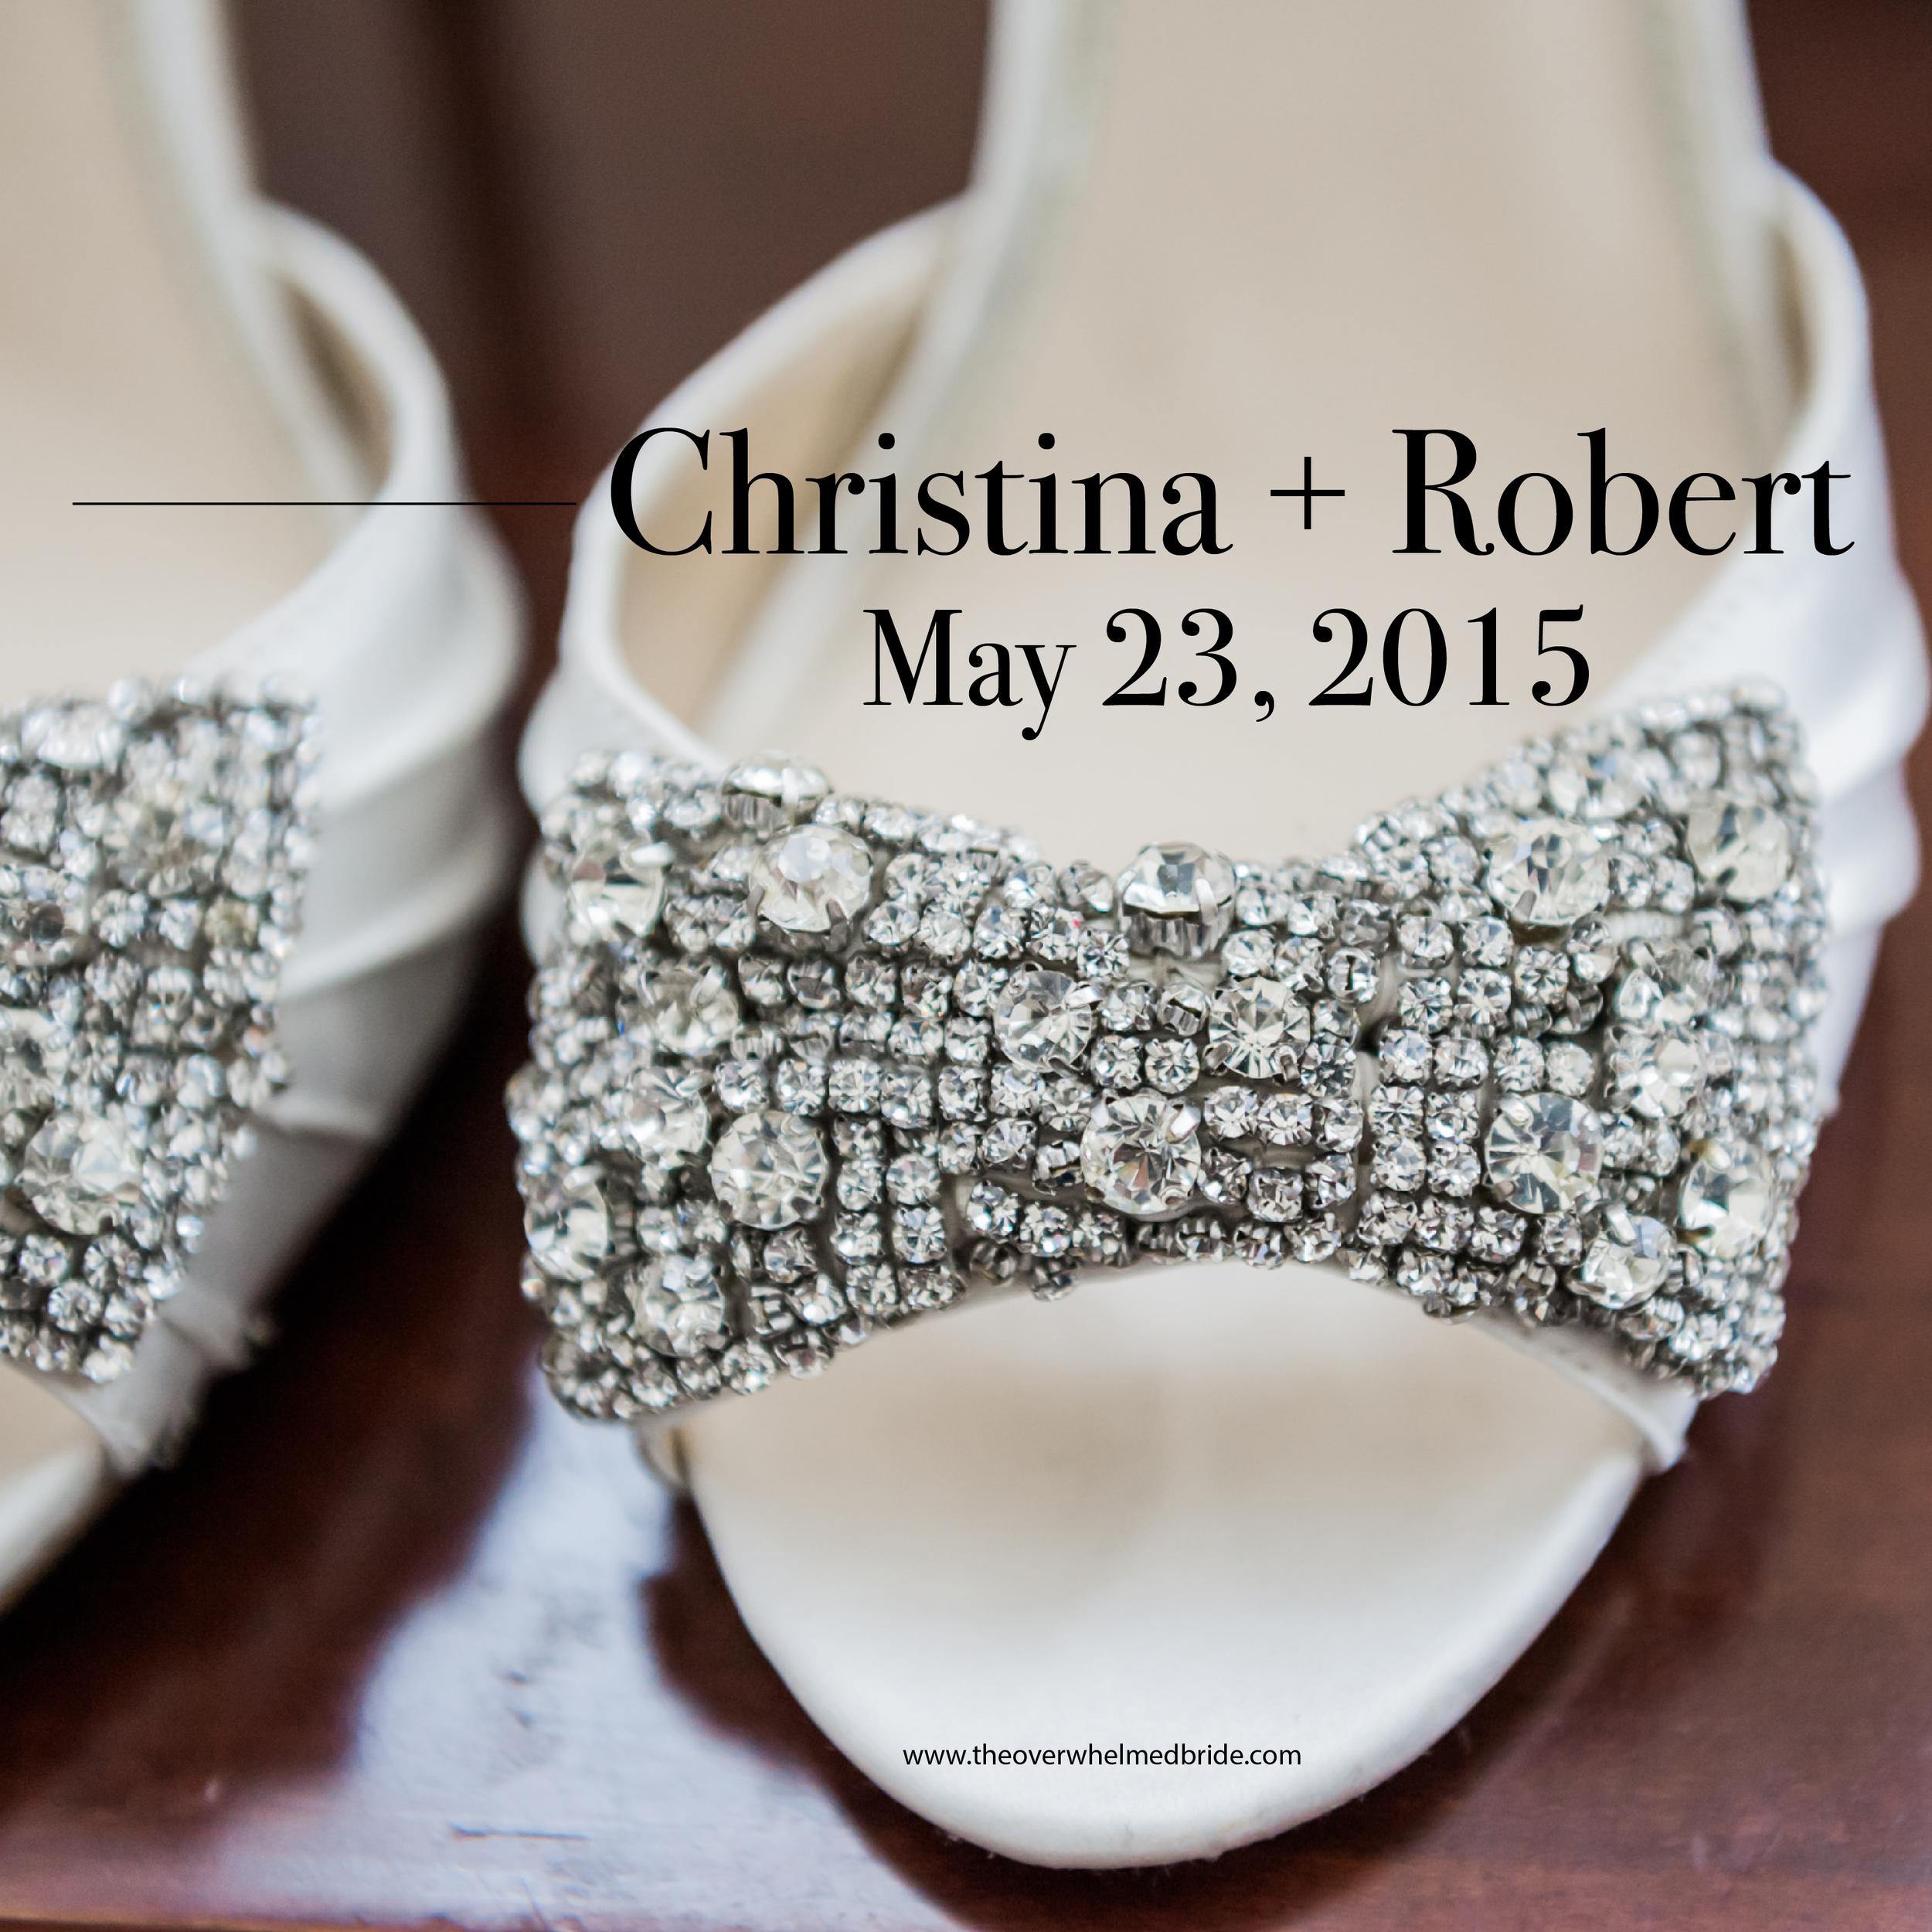 los angeles wedding venue // southern california wedding planner // the overwhelmed bride wedding blog